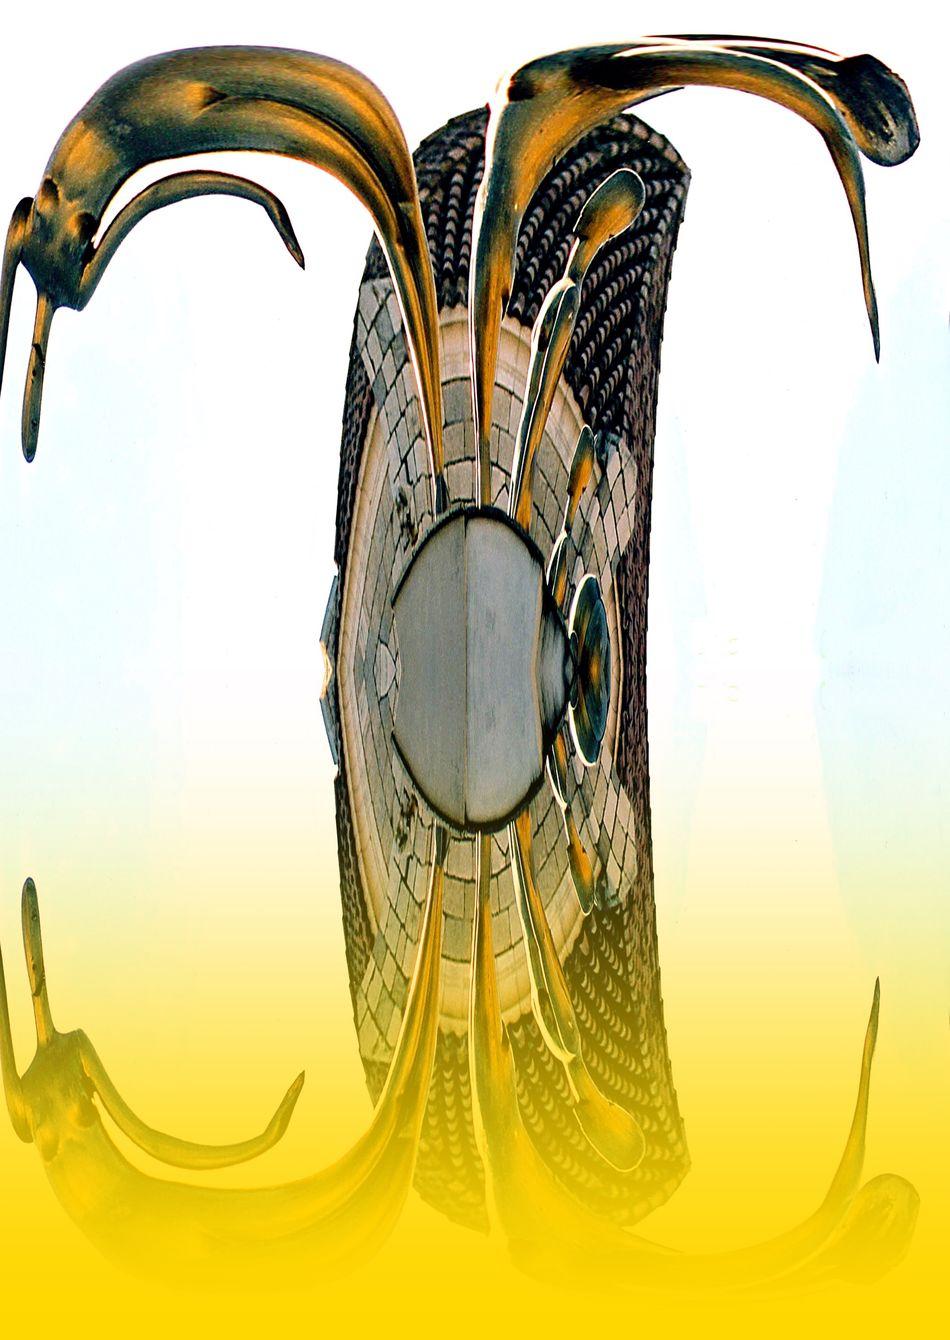 Creatividad Dali Figueres Dalí Esposicion Fotografia Jrosillo Srt Visual Impact EyeEm Awards 2016 EyeEm Best Shots Essence Of Summer People new talent Fine Art Photography Exceptional Photographs